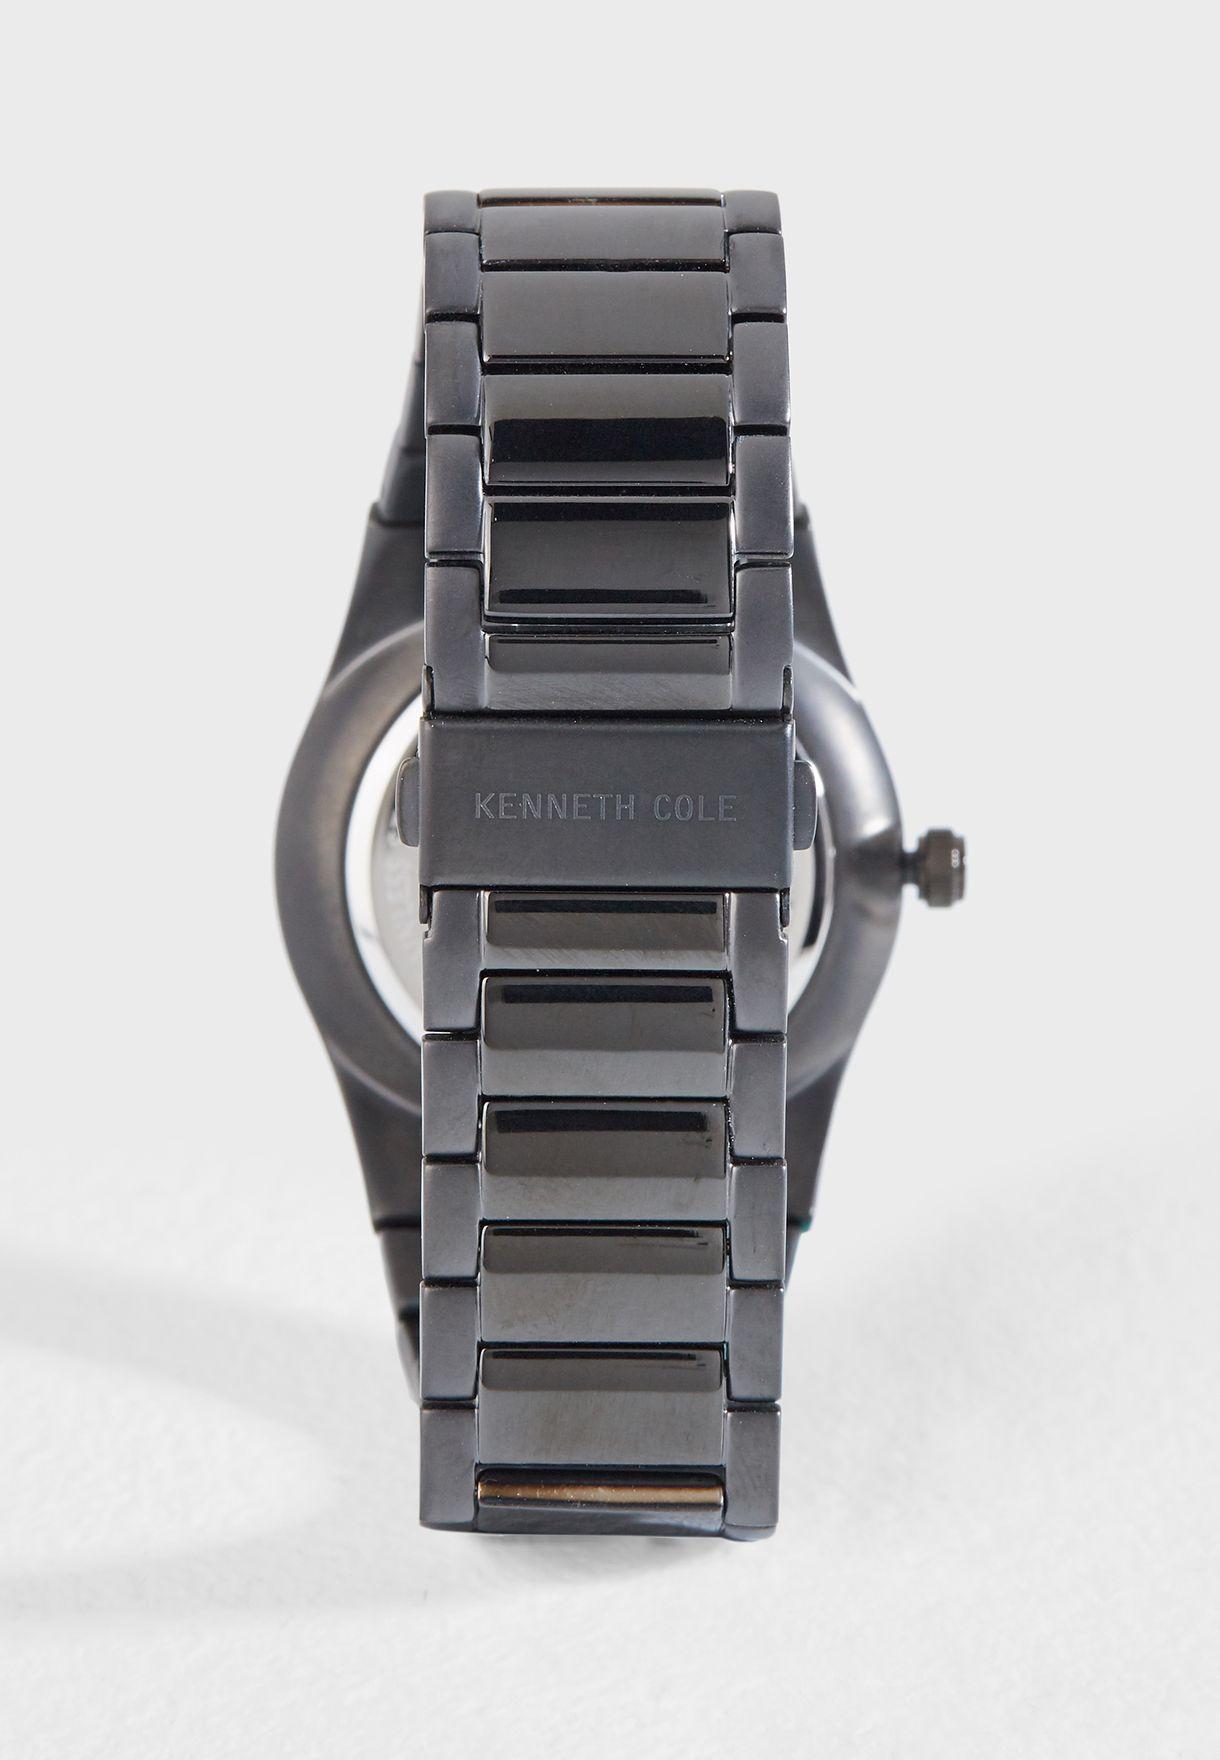 KC15103012 Date Display Watch